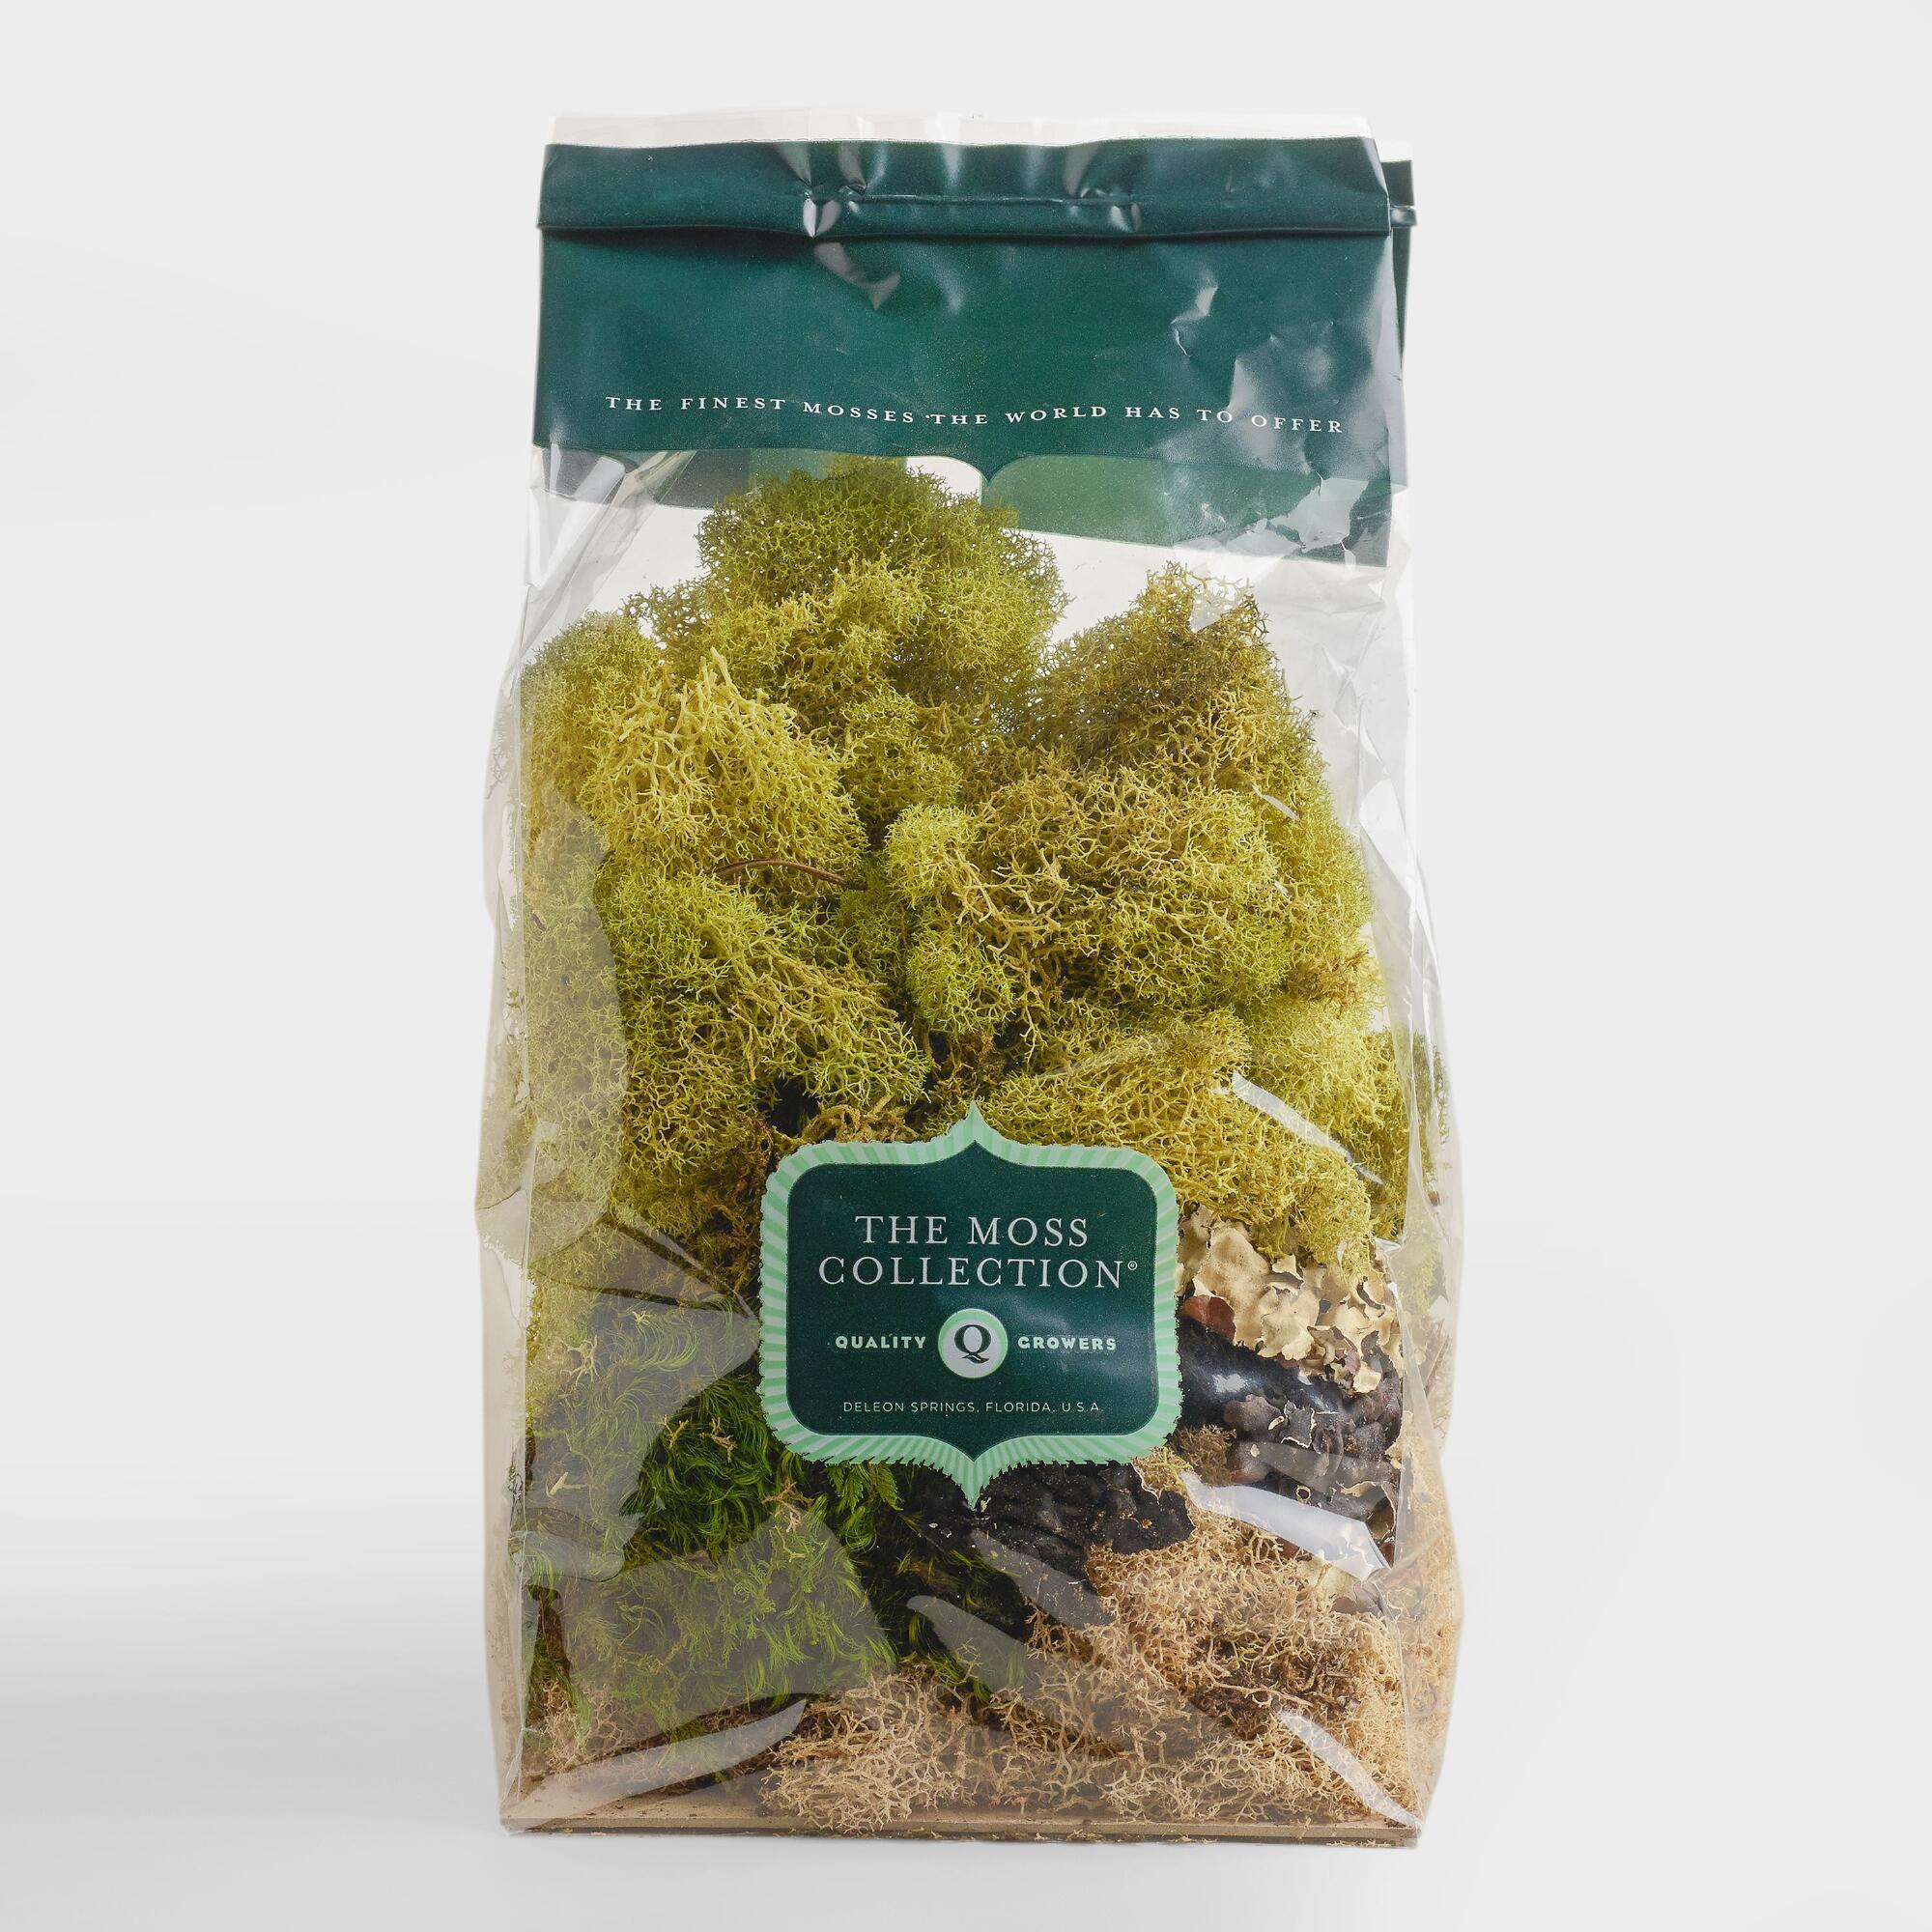 moss ball vase filler of moss vase filler green by world market products pinterest throughout moss vase filler green by world market